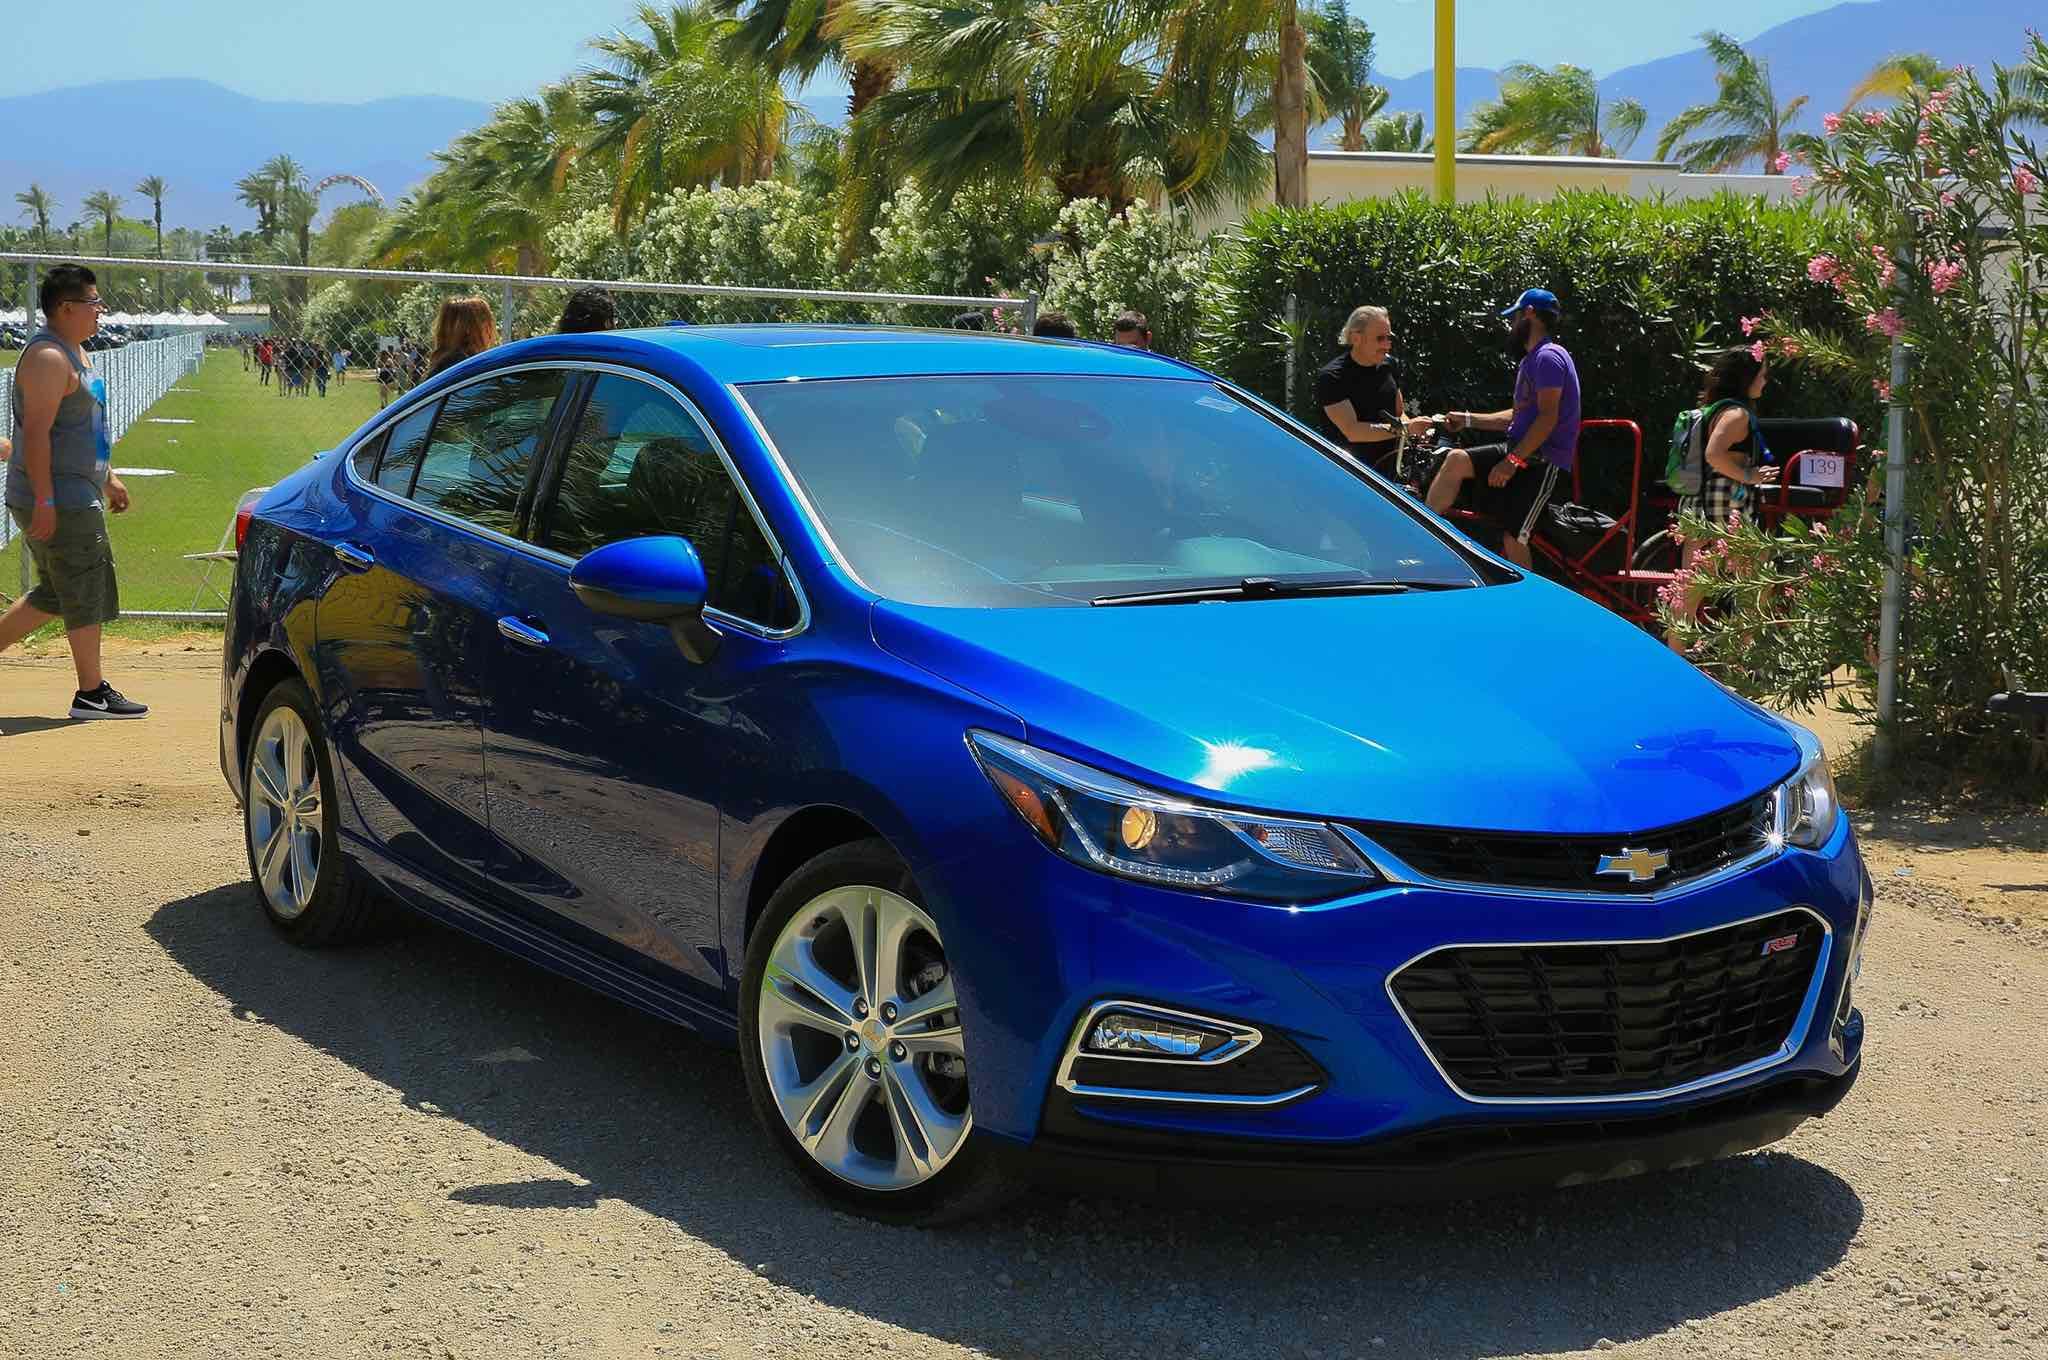 Chevrolet Cruze Launch Event Coachella